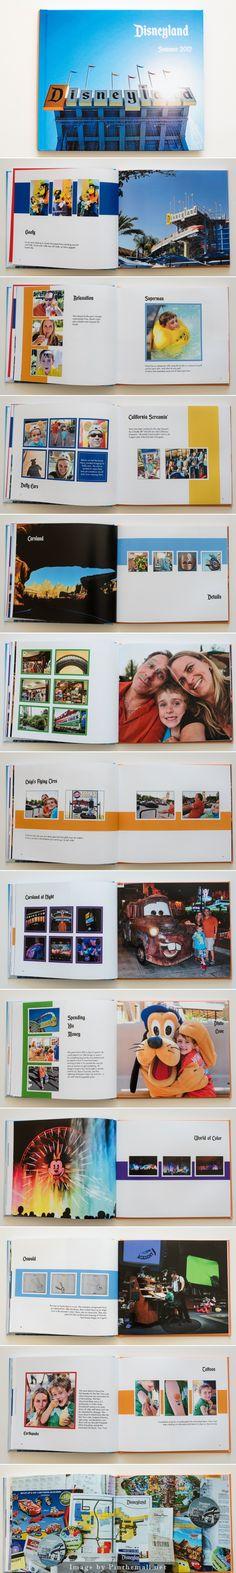 Disneyland Photo Book.